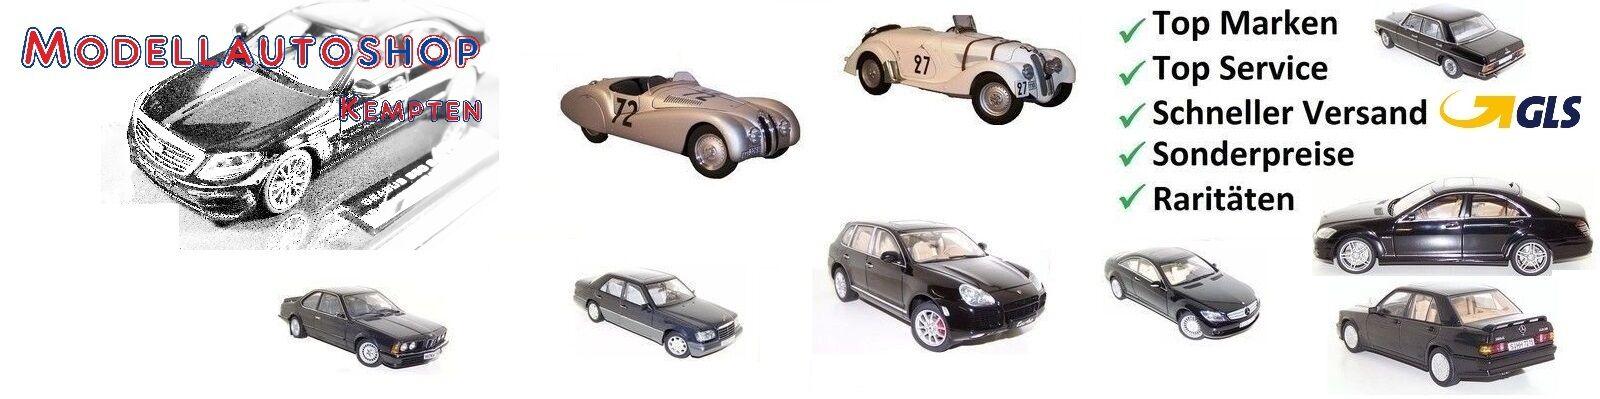 Modellautoshop-Kempten